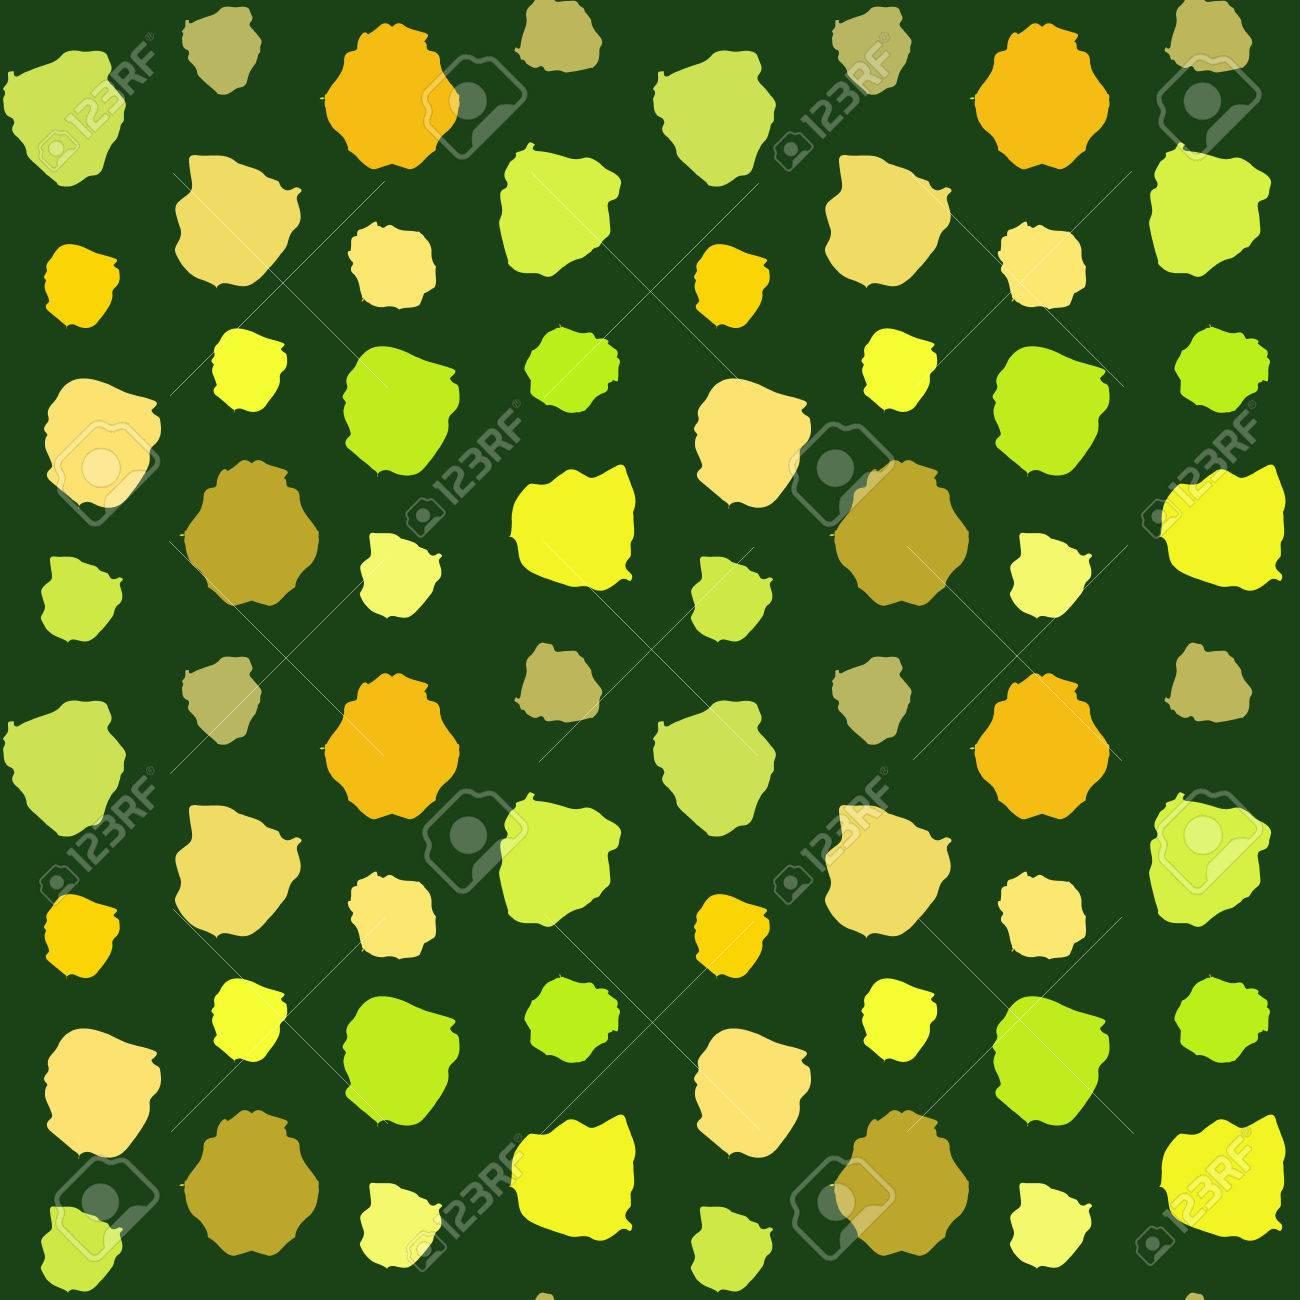 Vector Yellow And Green Polka Dot Seamless Pattern. Abstract ...